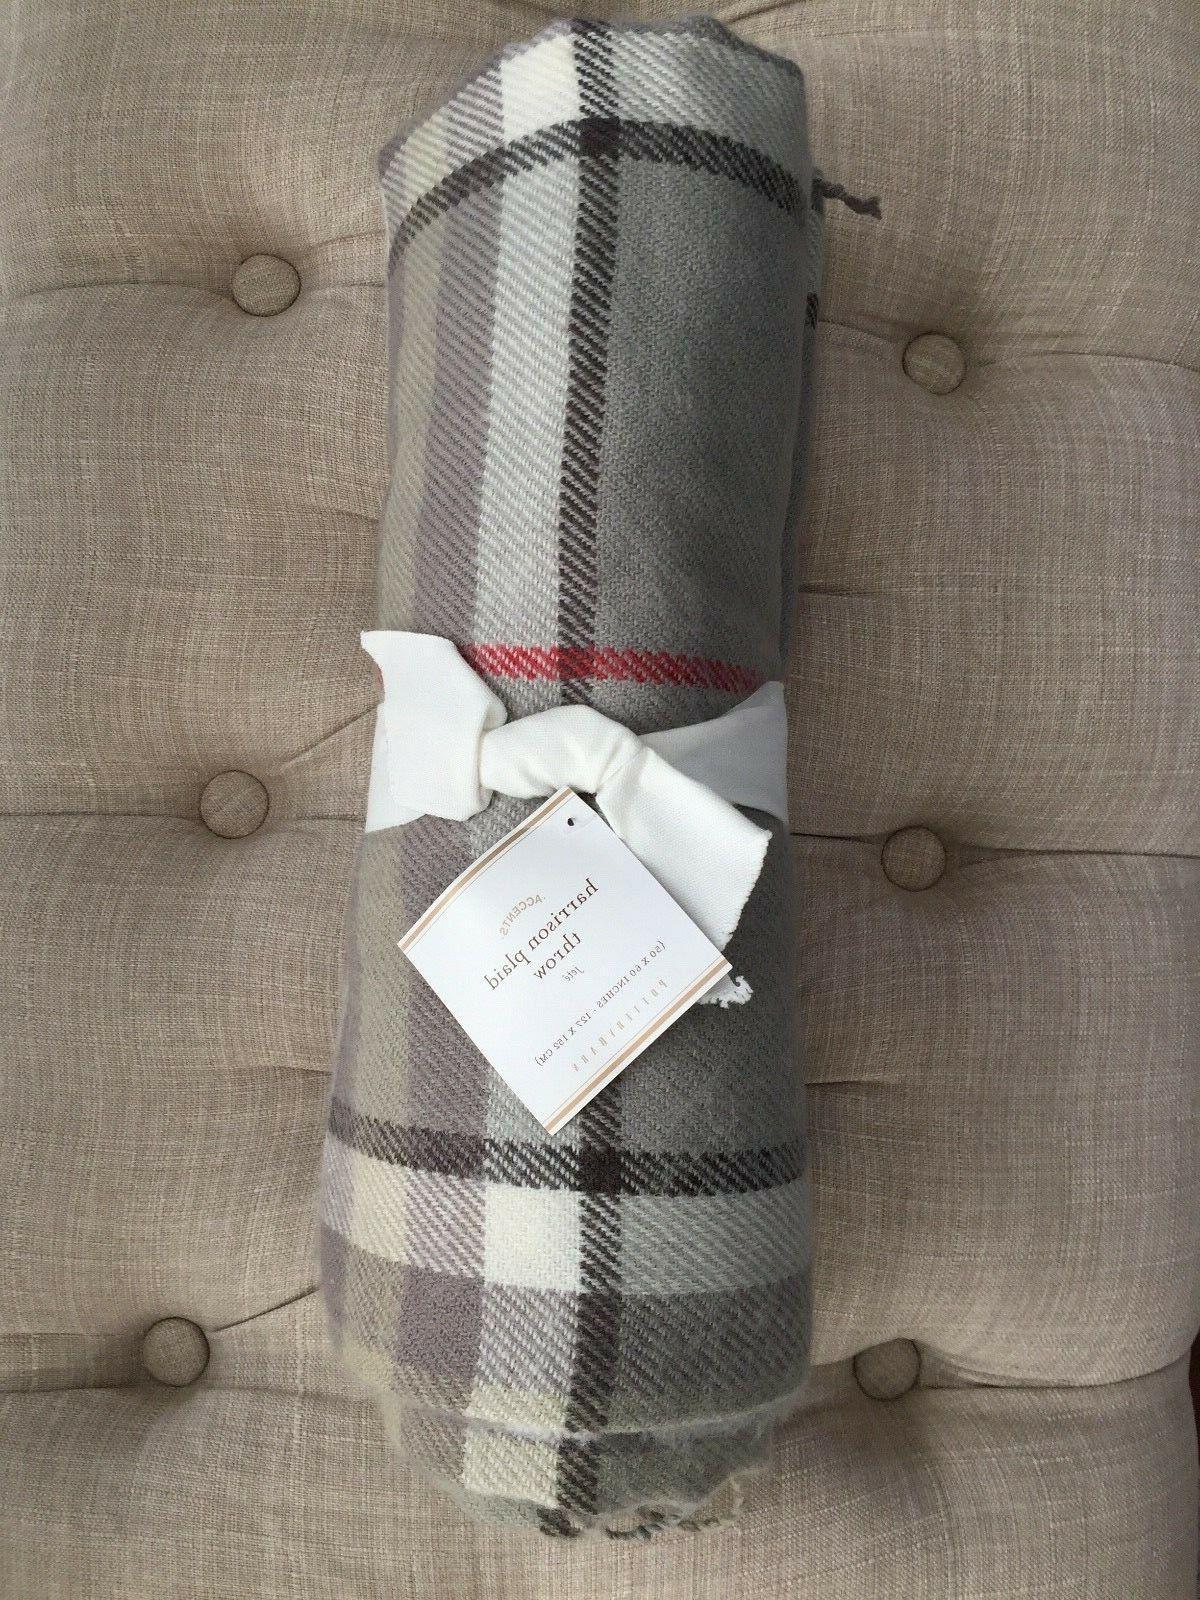 new harrison plaid fringed throw blanket holiday